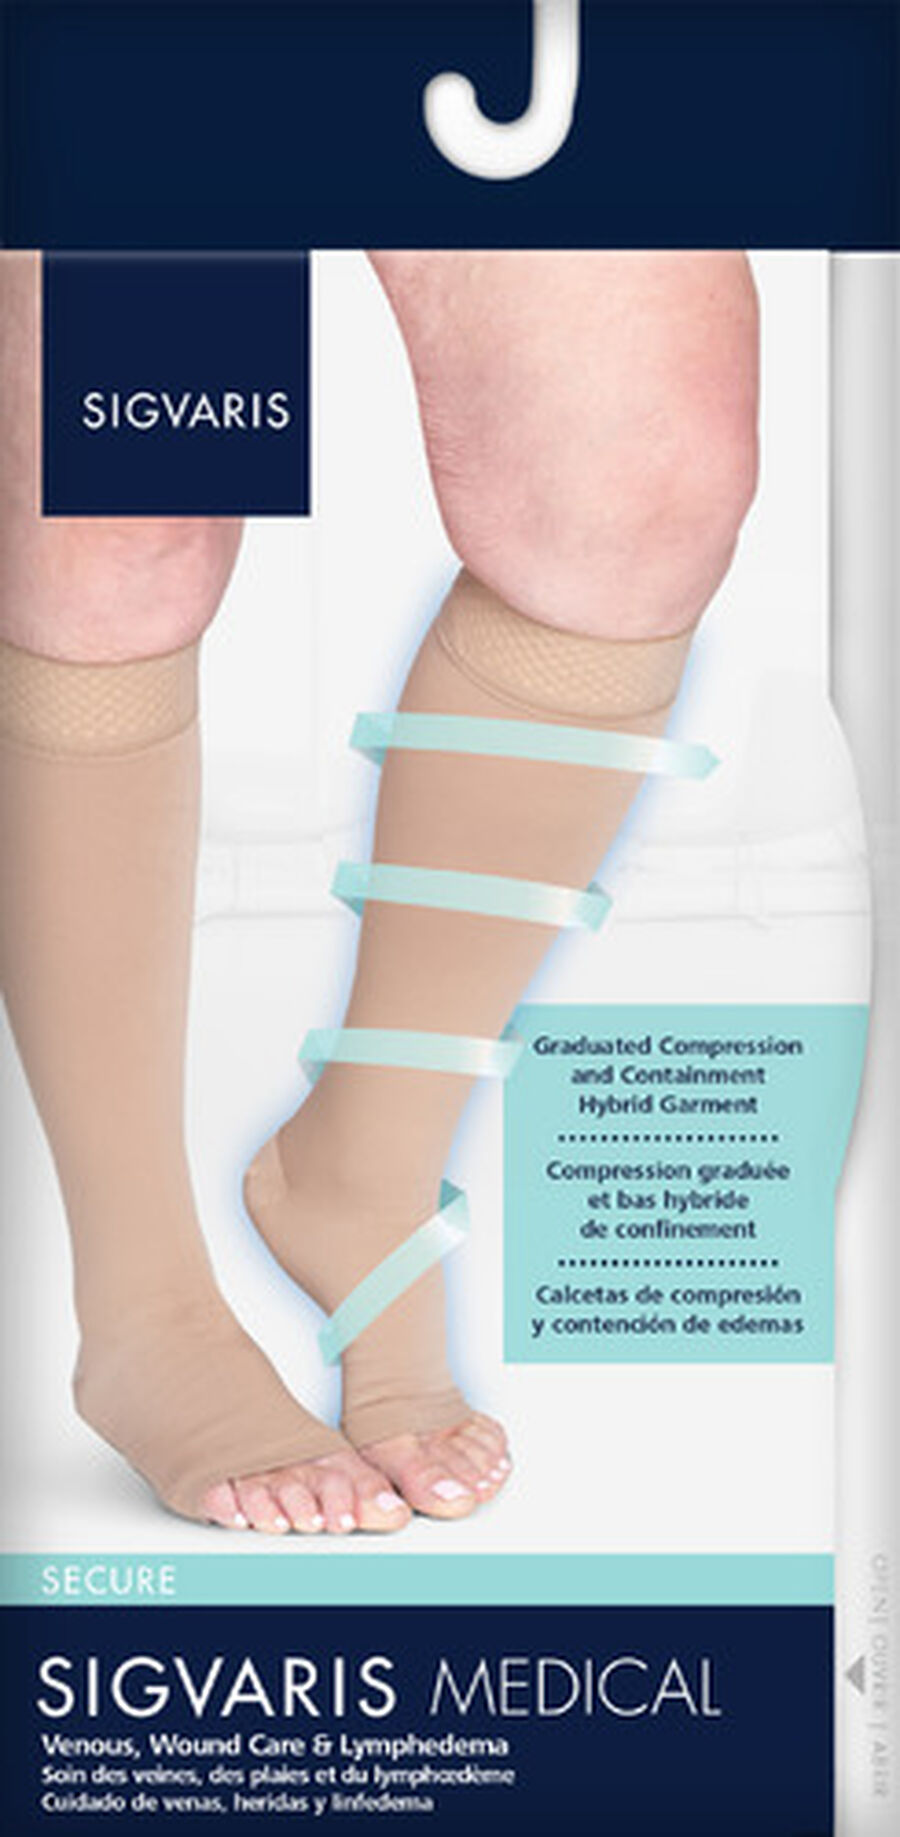 SIGVARIS Natural Rubber Unisex Socks, Open Toe, Small Short, Beige, , large image number 3